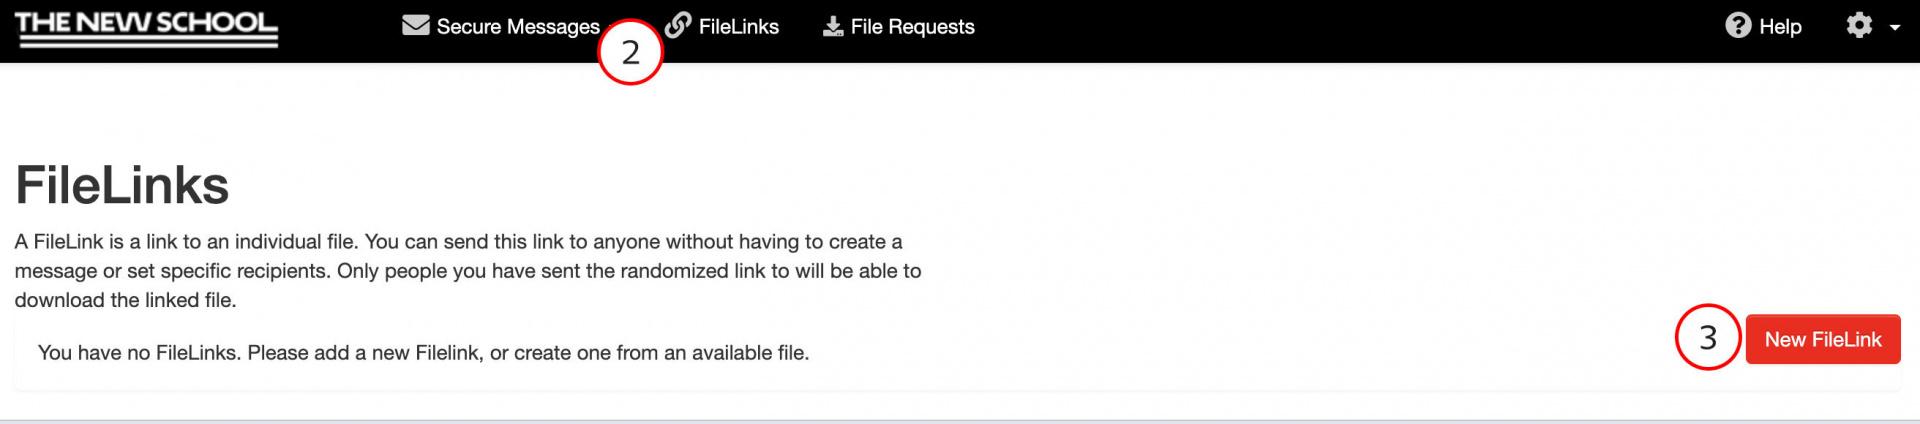 New File Link